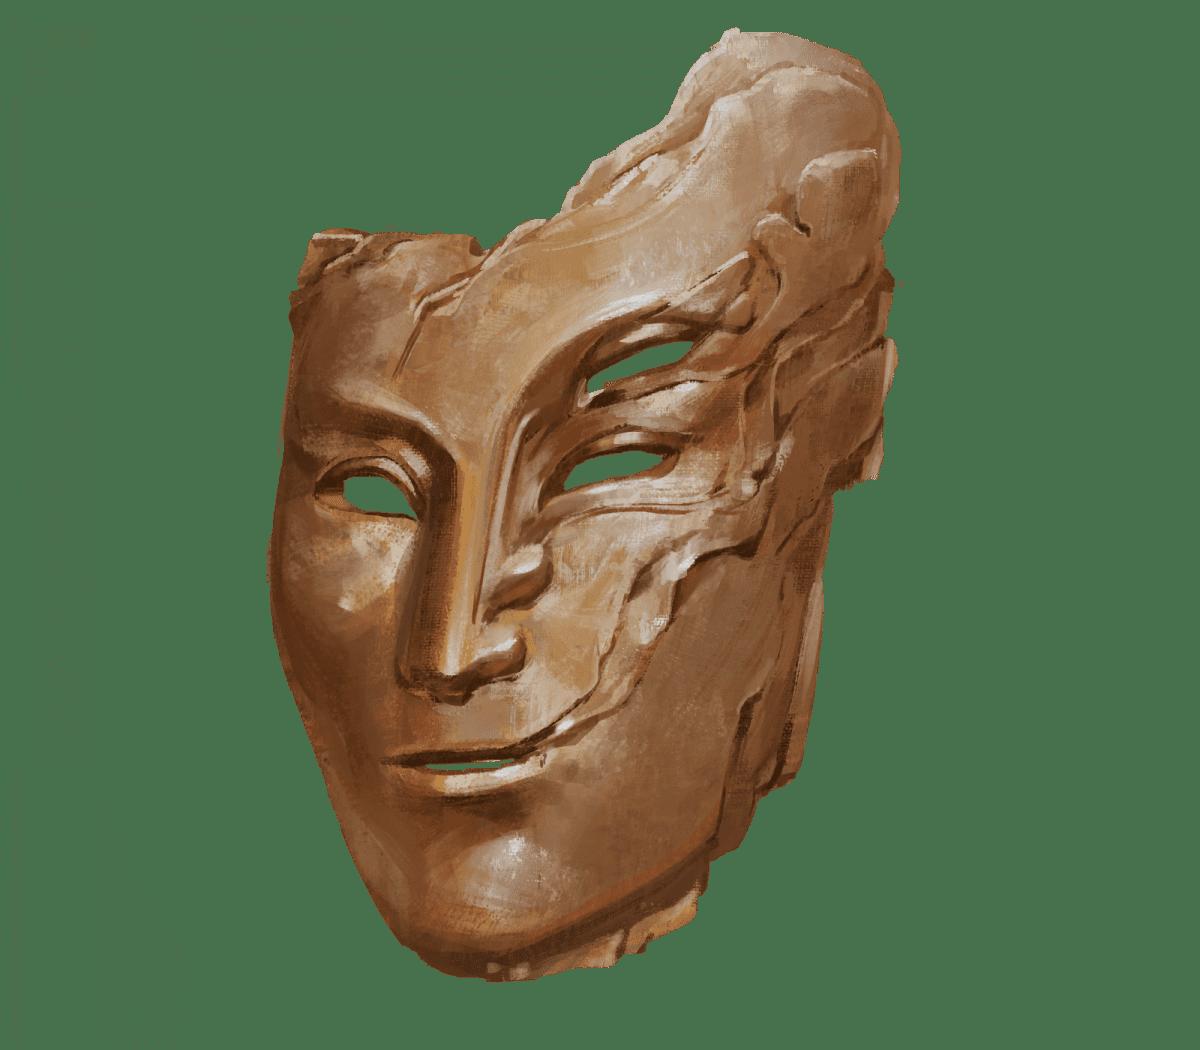 A magical mask